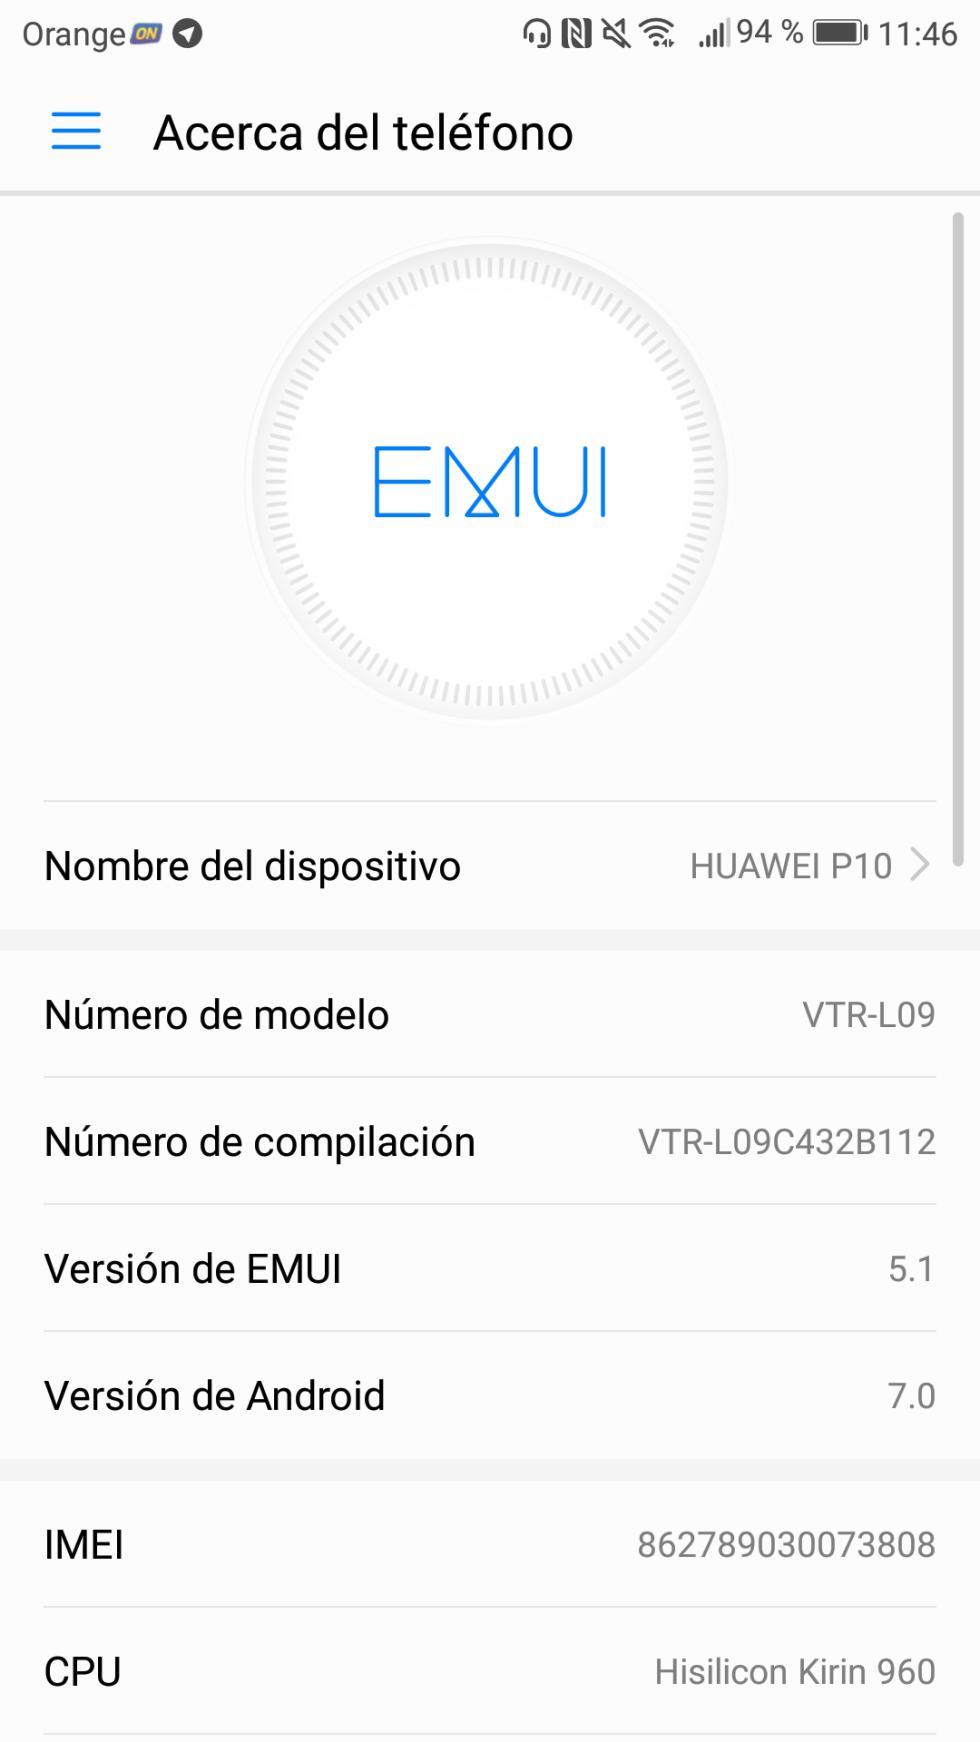 La capa de EMUI 5.1 del Huawei P10 funciona bajo Android 7.1 Nougat